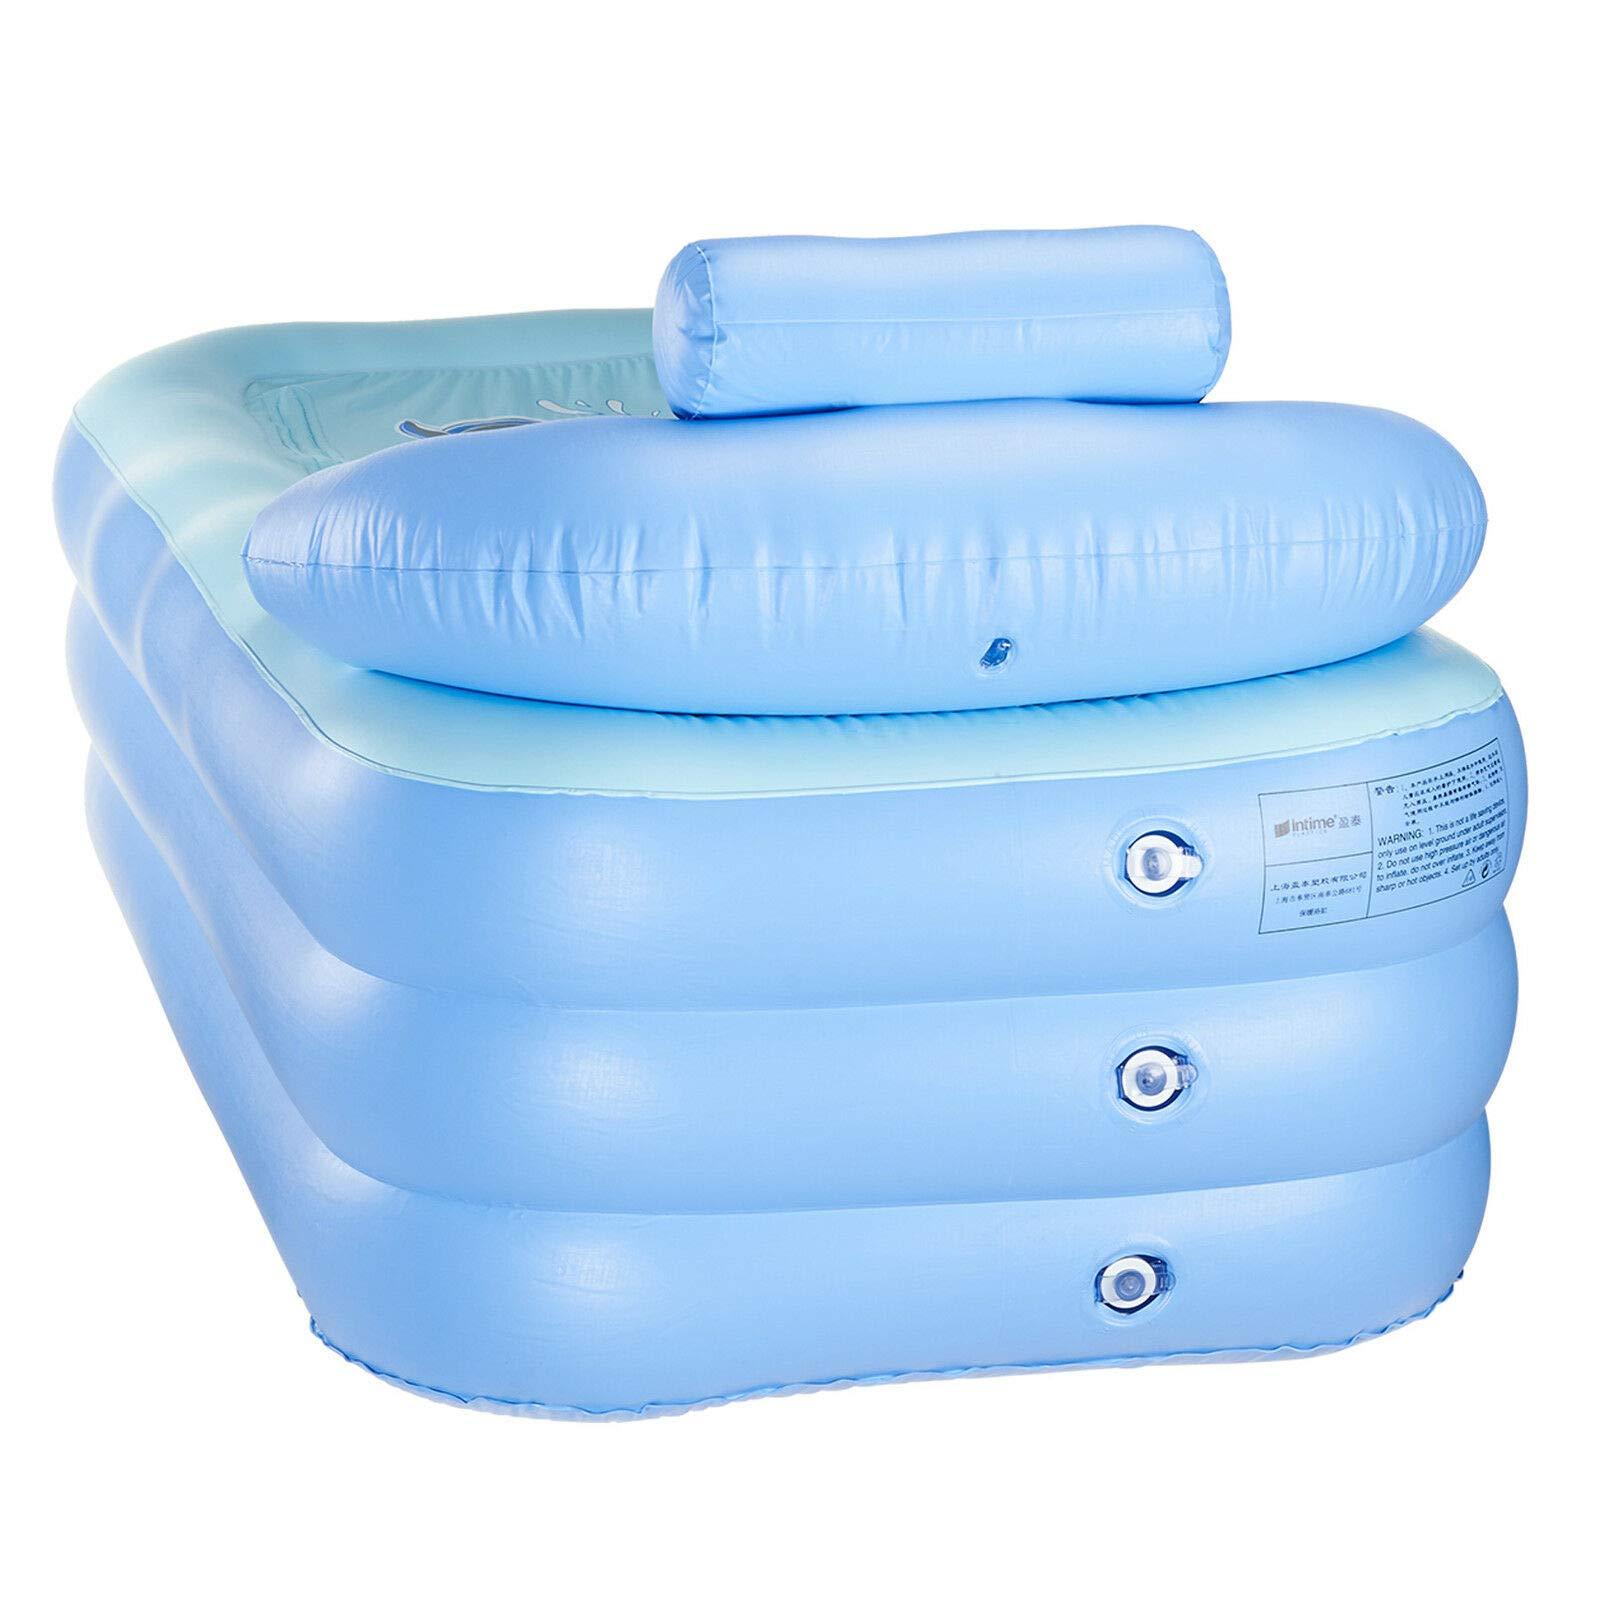 LZHQT Blow Up Adult PVC Folding Portable Foldable Bathtub Inflatable Bath Tub Air Pump by LZHQT (Image #5)